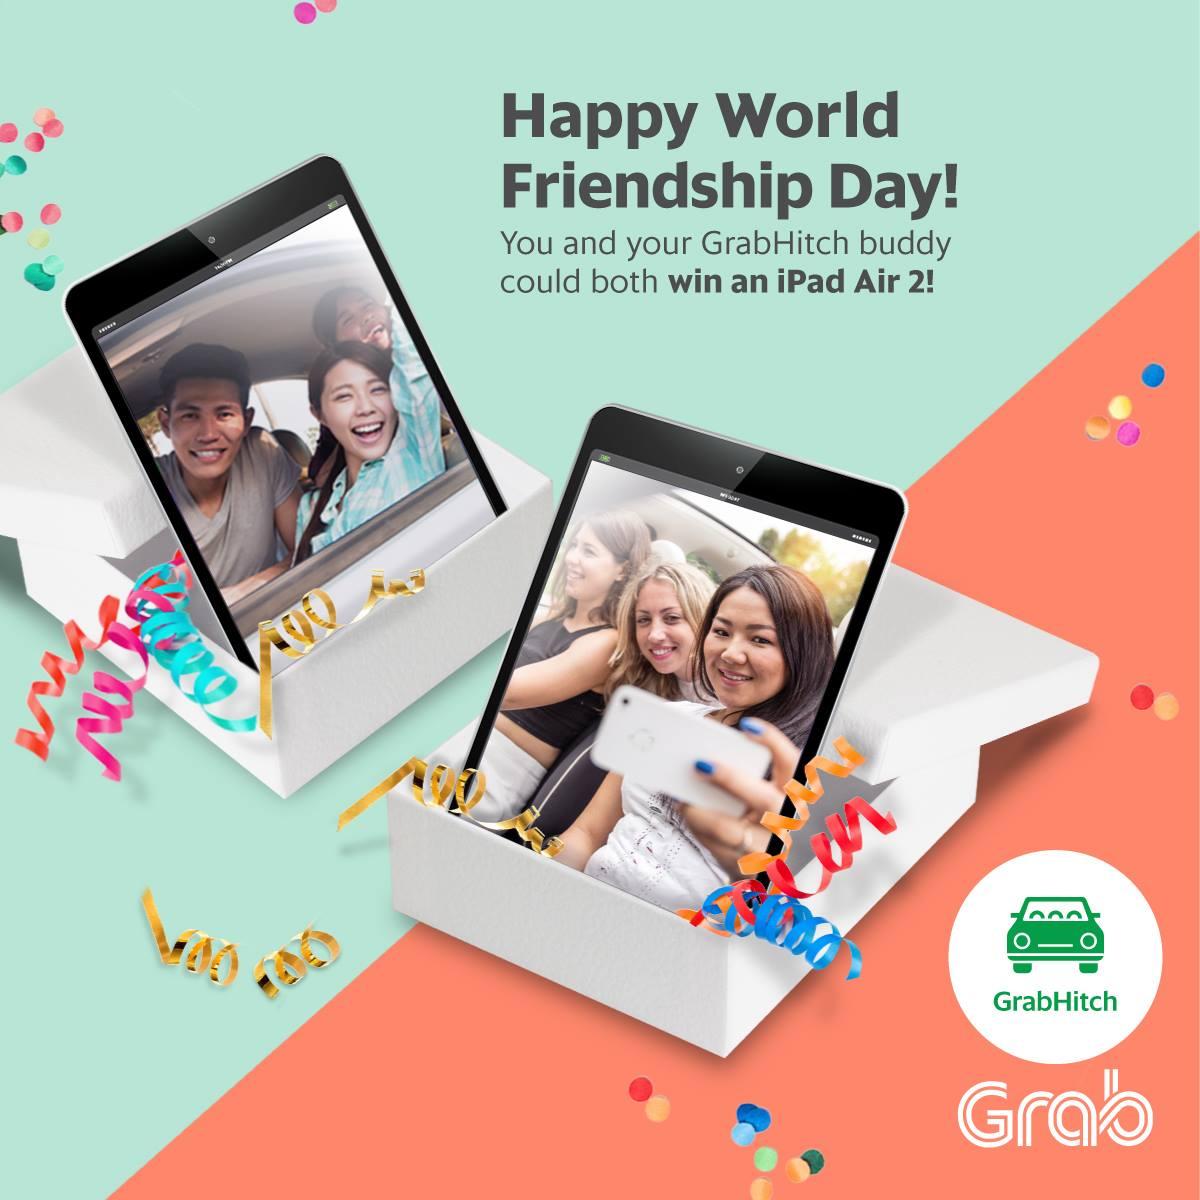 GrabHitch Friendship Day Singapore Contest ends 7 Aug 2016